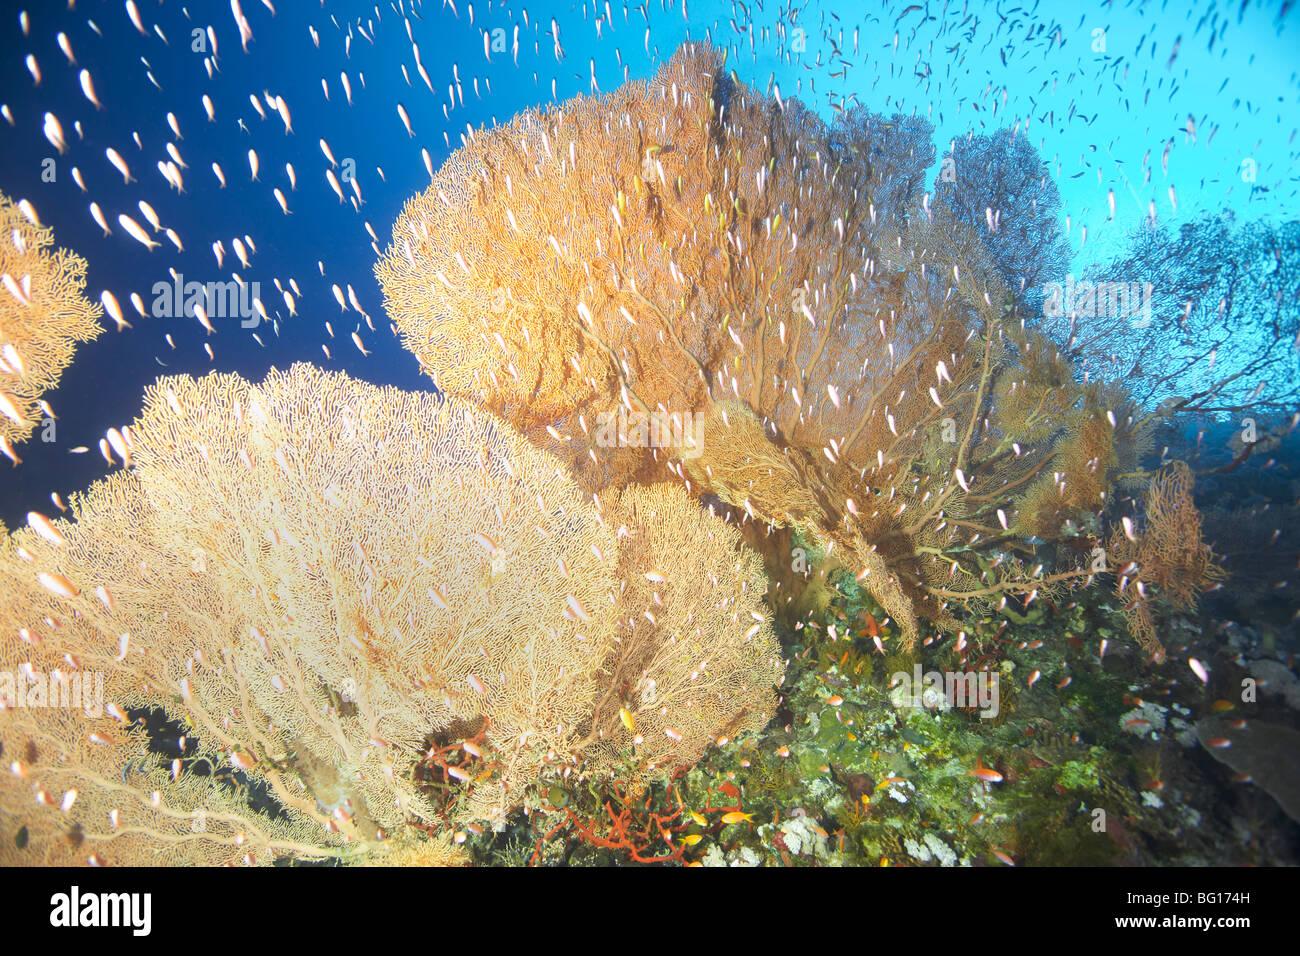 Giant fan coral stock photo 27072433 alamy giant fan coral publicscrutiny Choice Image